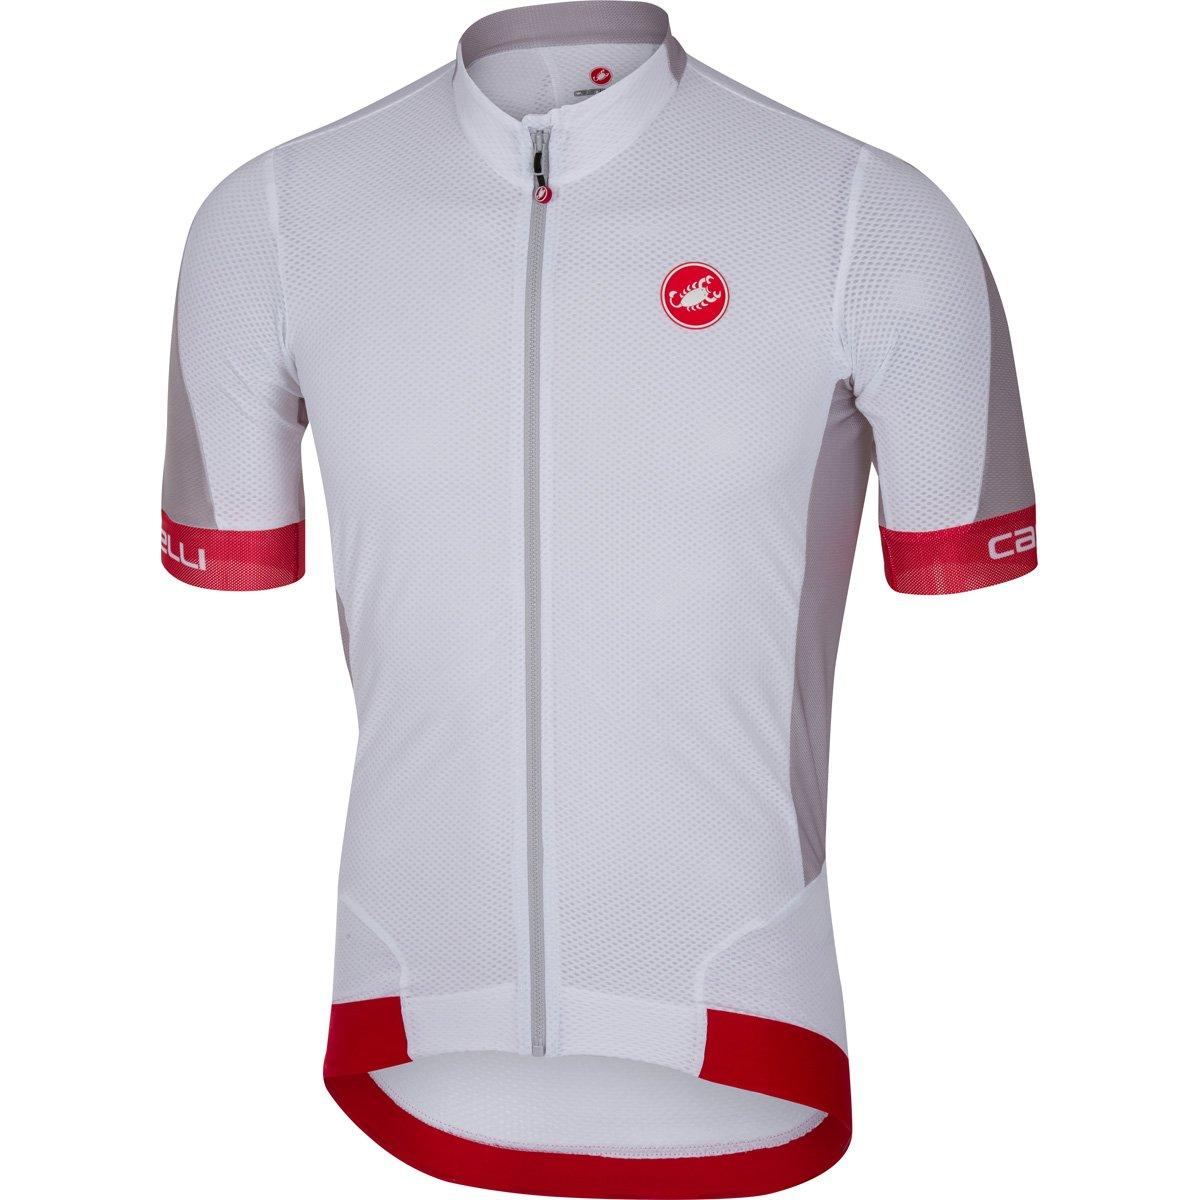 CastelliメンズVolata 2 Bike jersey fz B06XHPRSTQ XX-Large|ホワイト/レッド ホワイト/レッド XX-Large